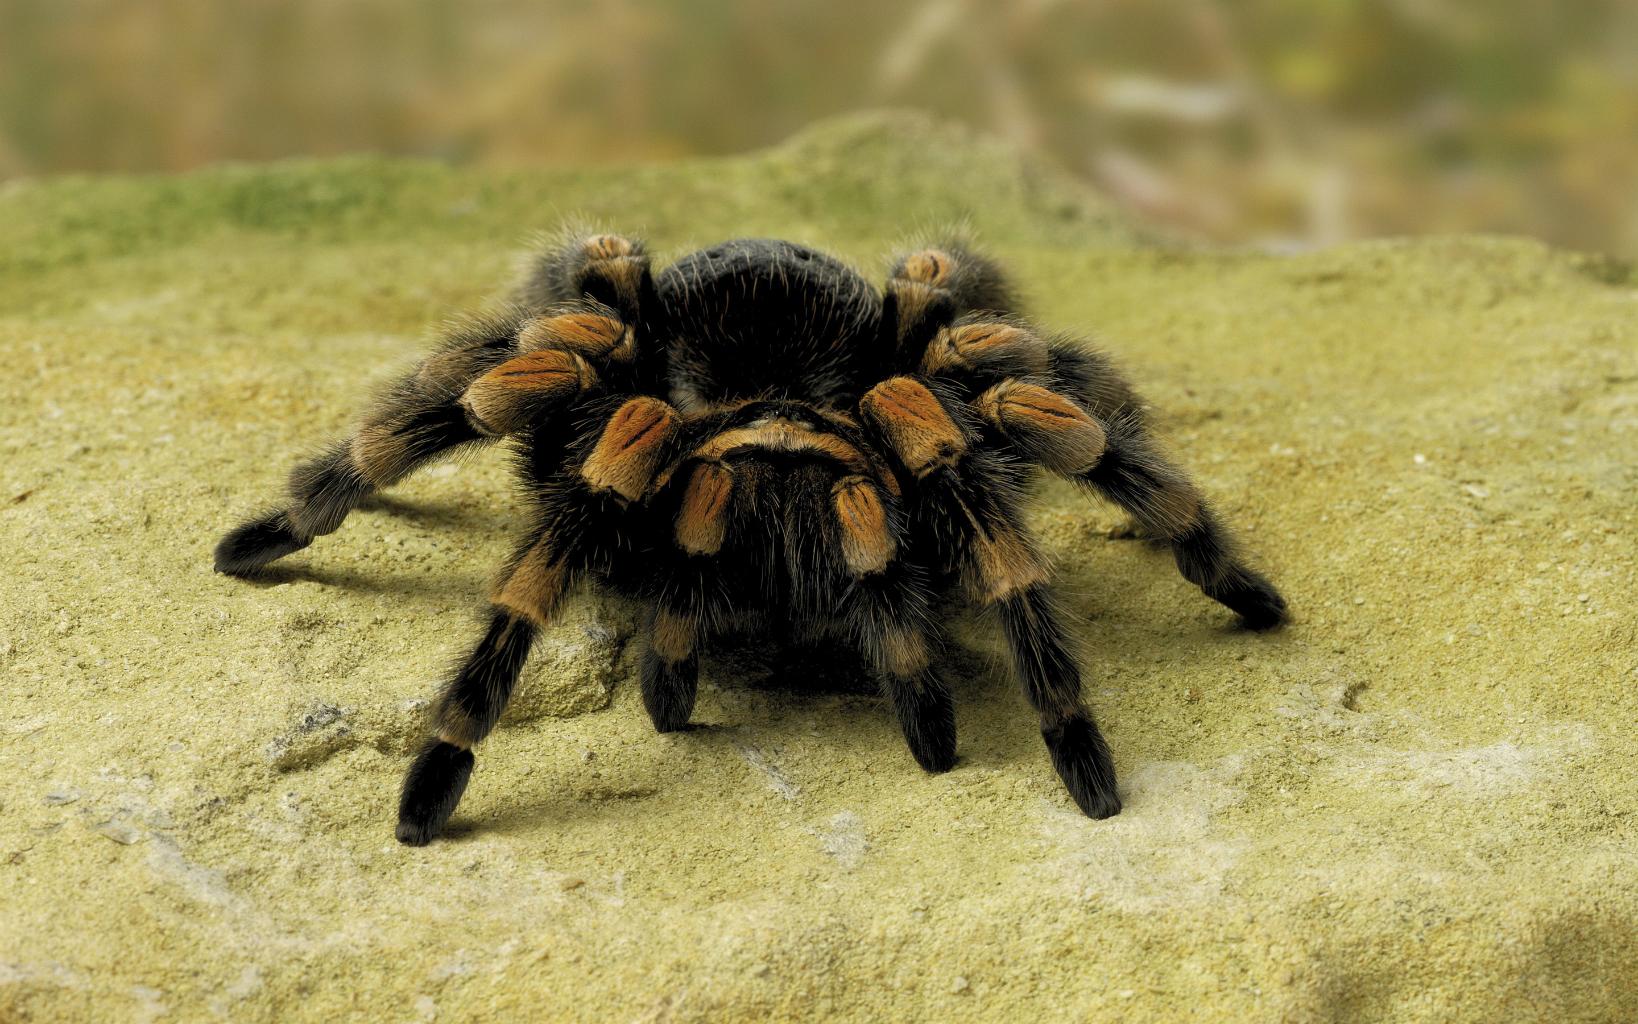 spiderr